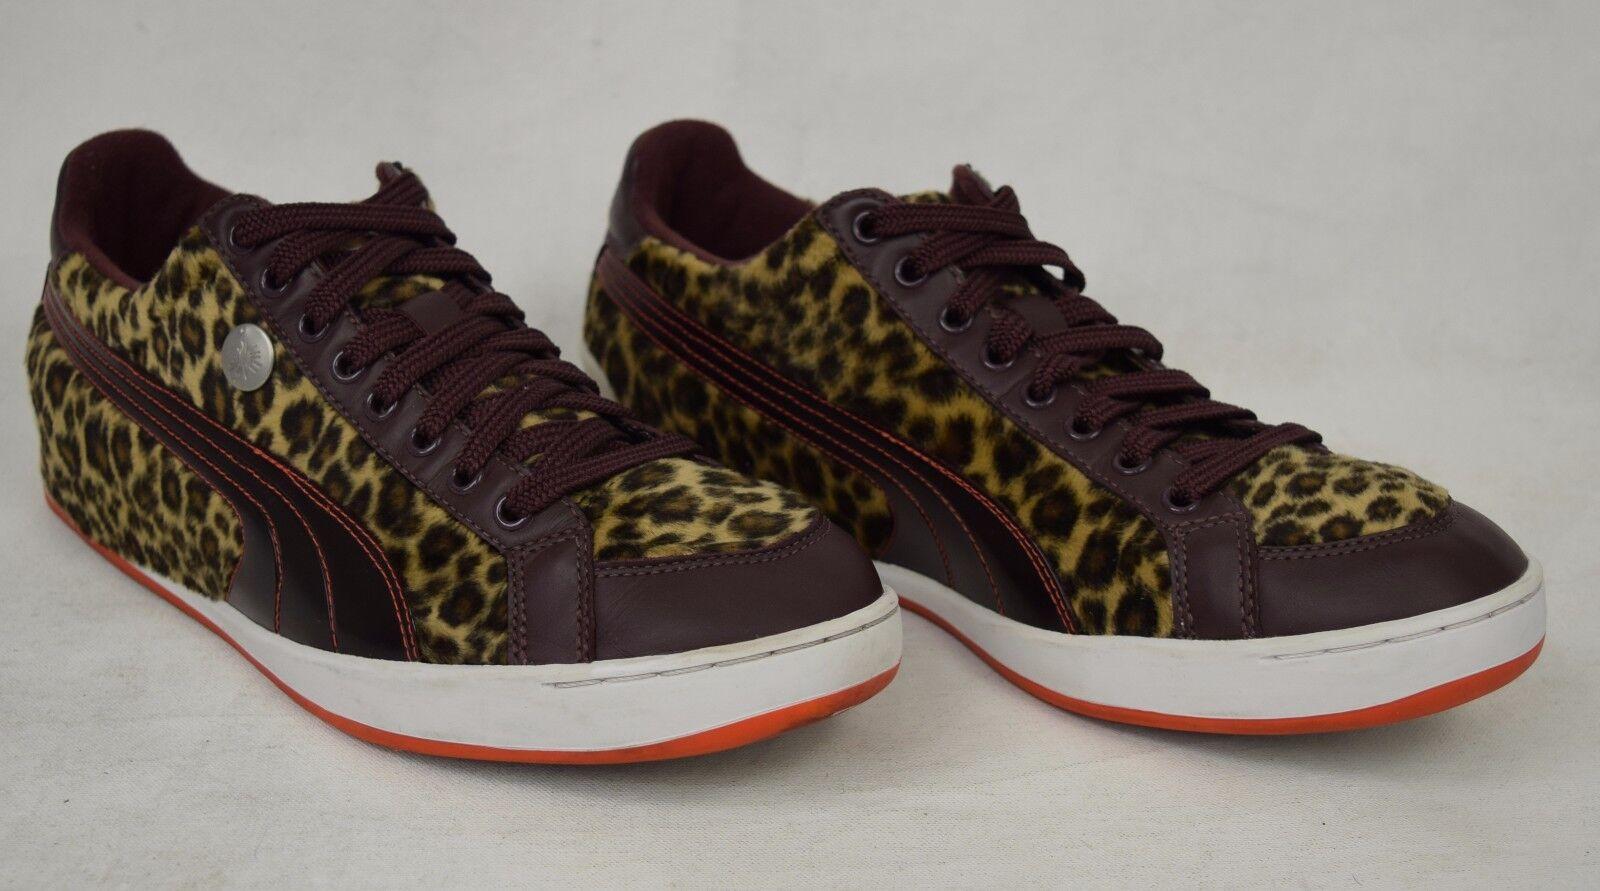 Scarpe casual da uomo  Puma Brown Mihara Yasuhiro MY-20 Leopard Brown Puma Shoes Sneakers 11 uomos 343863 01 c96d44